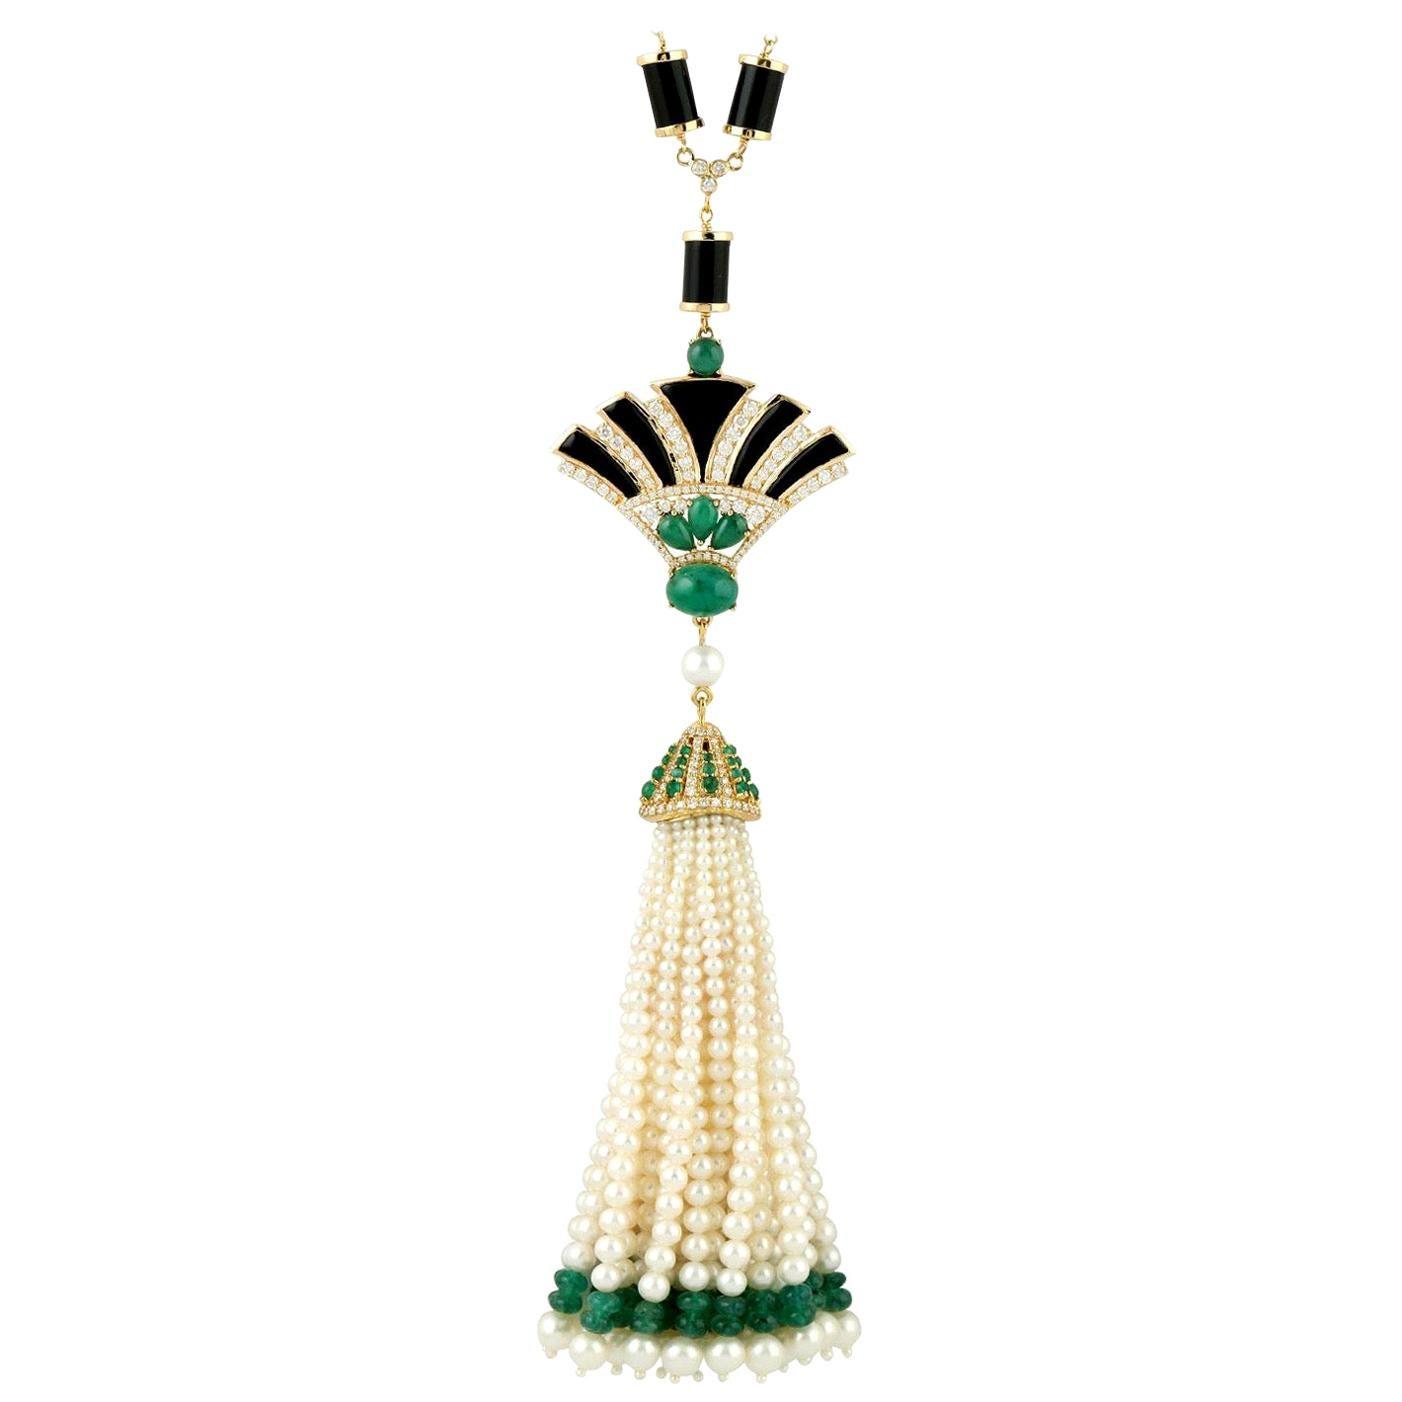 45.96 Carat Emerald Diamond Art Deco Style 18 Karat Gold Pearl Tassel Necklace